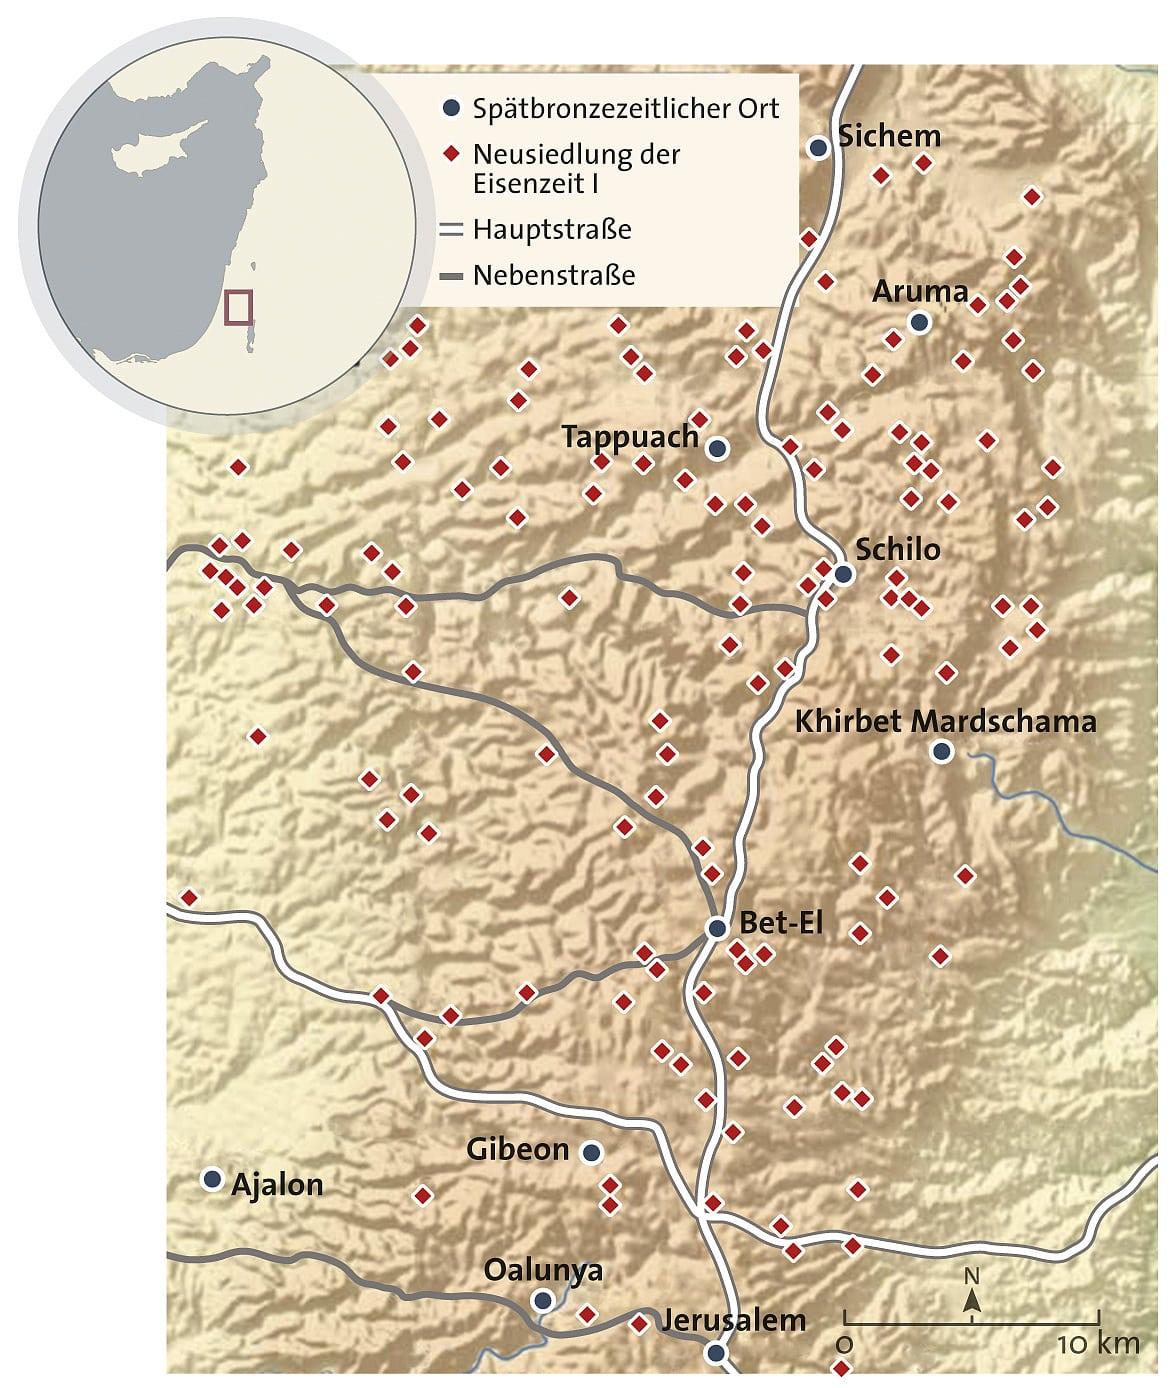 Israel bibel landkarte Israel und